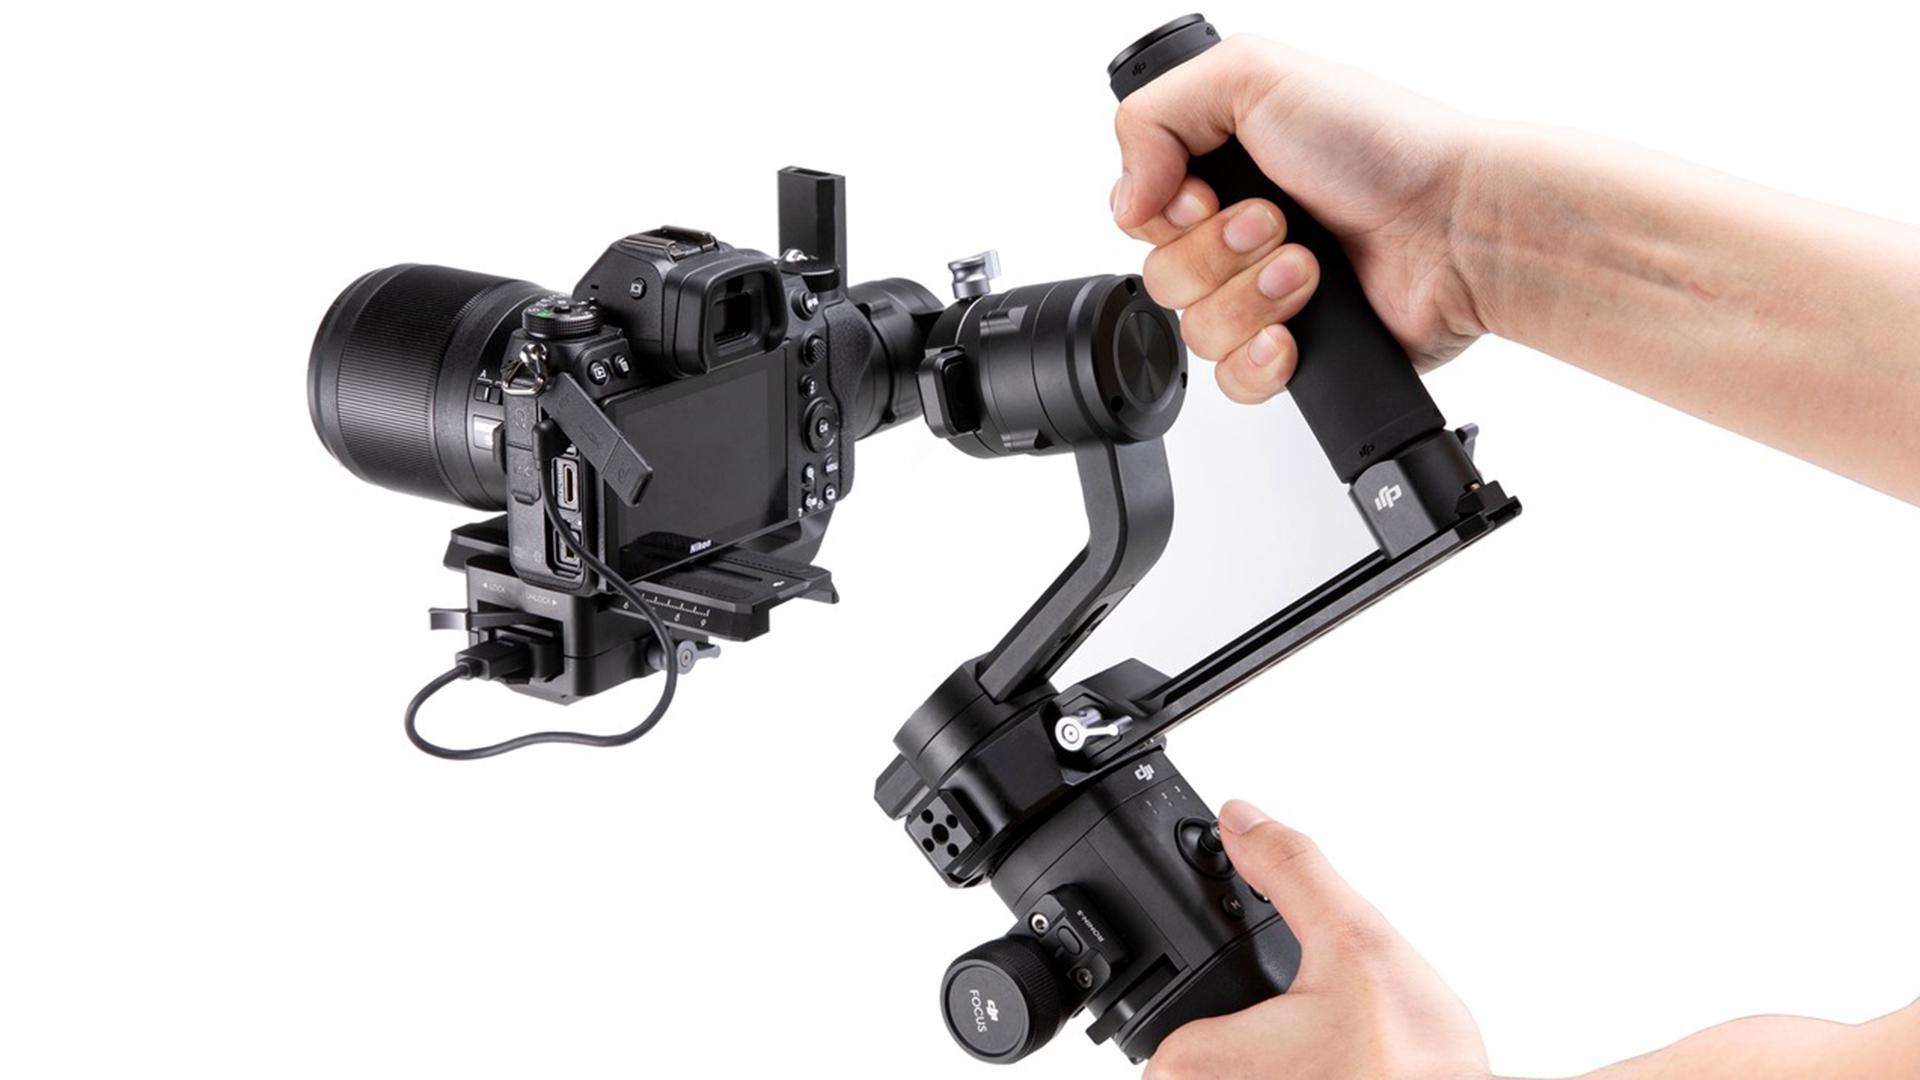 DJI lanza el Ronin-S Switch Grip Dual Handle